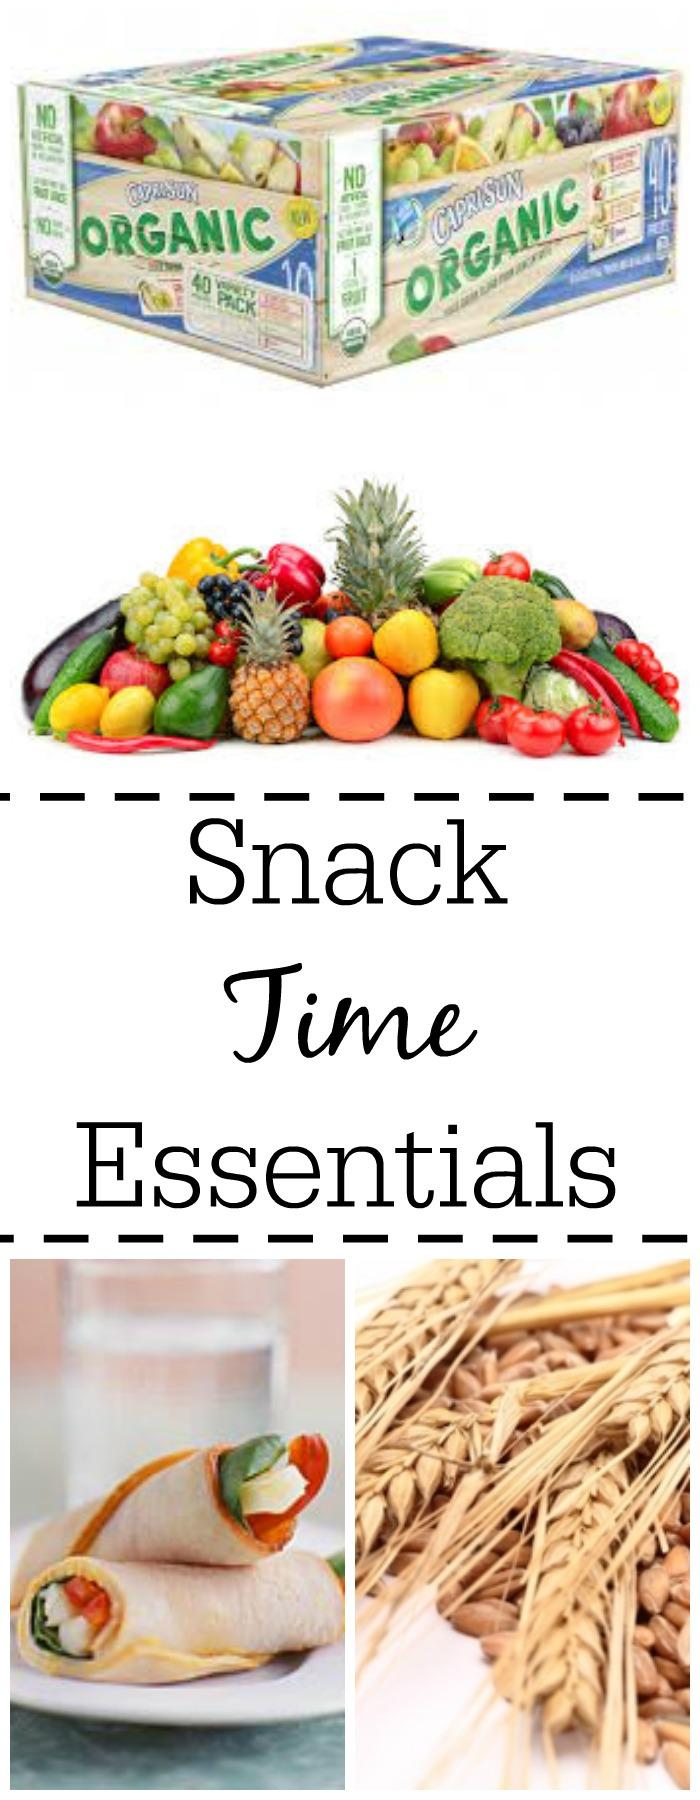 Kid Snack Time Essentials